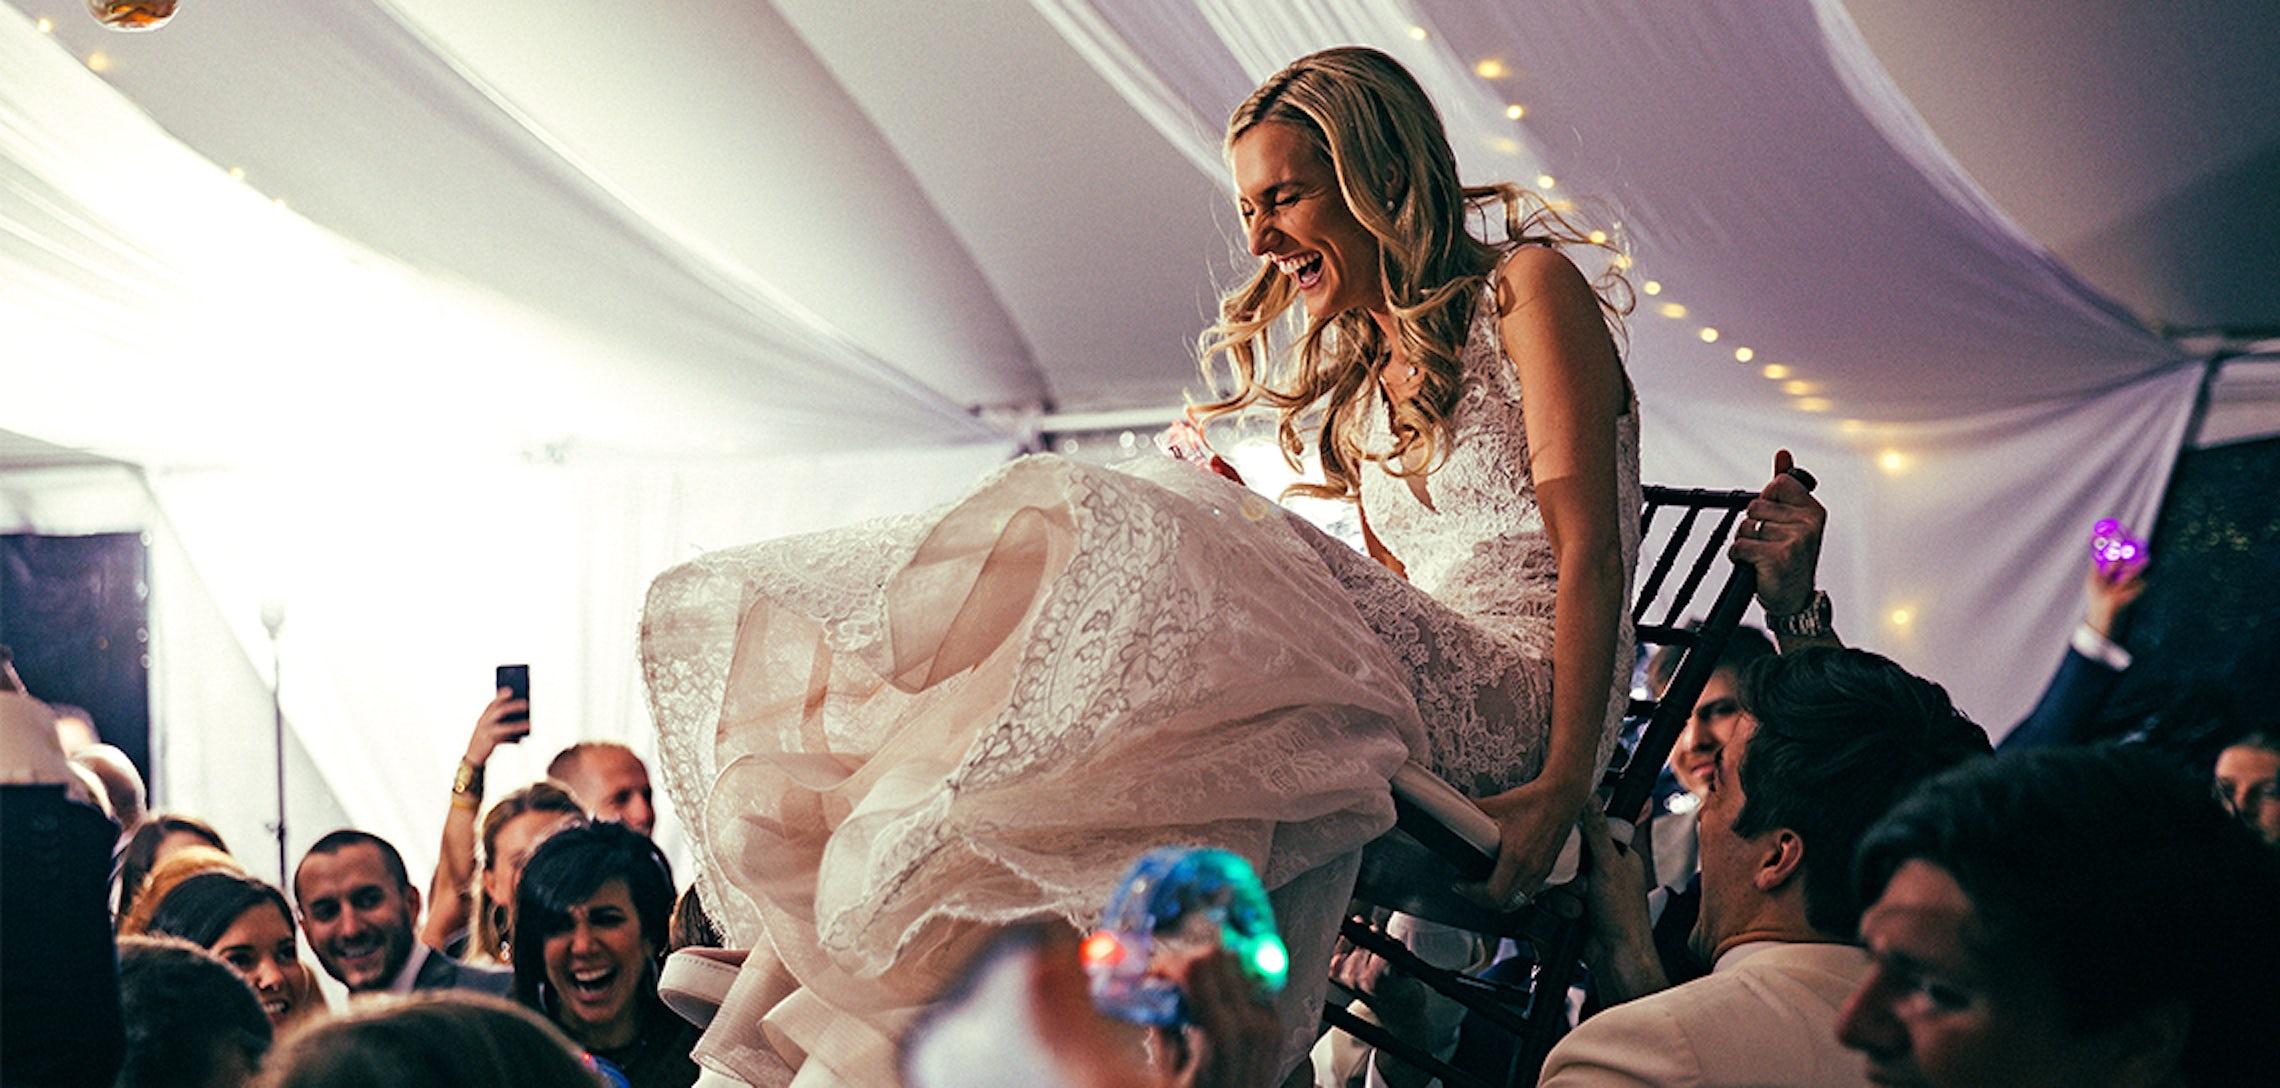 c06a5ea4bbae Signature Wedding: Selby Kean & Mason Thompson - inRegister